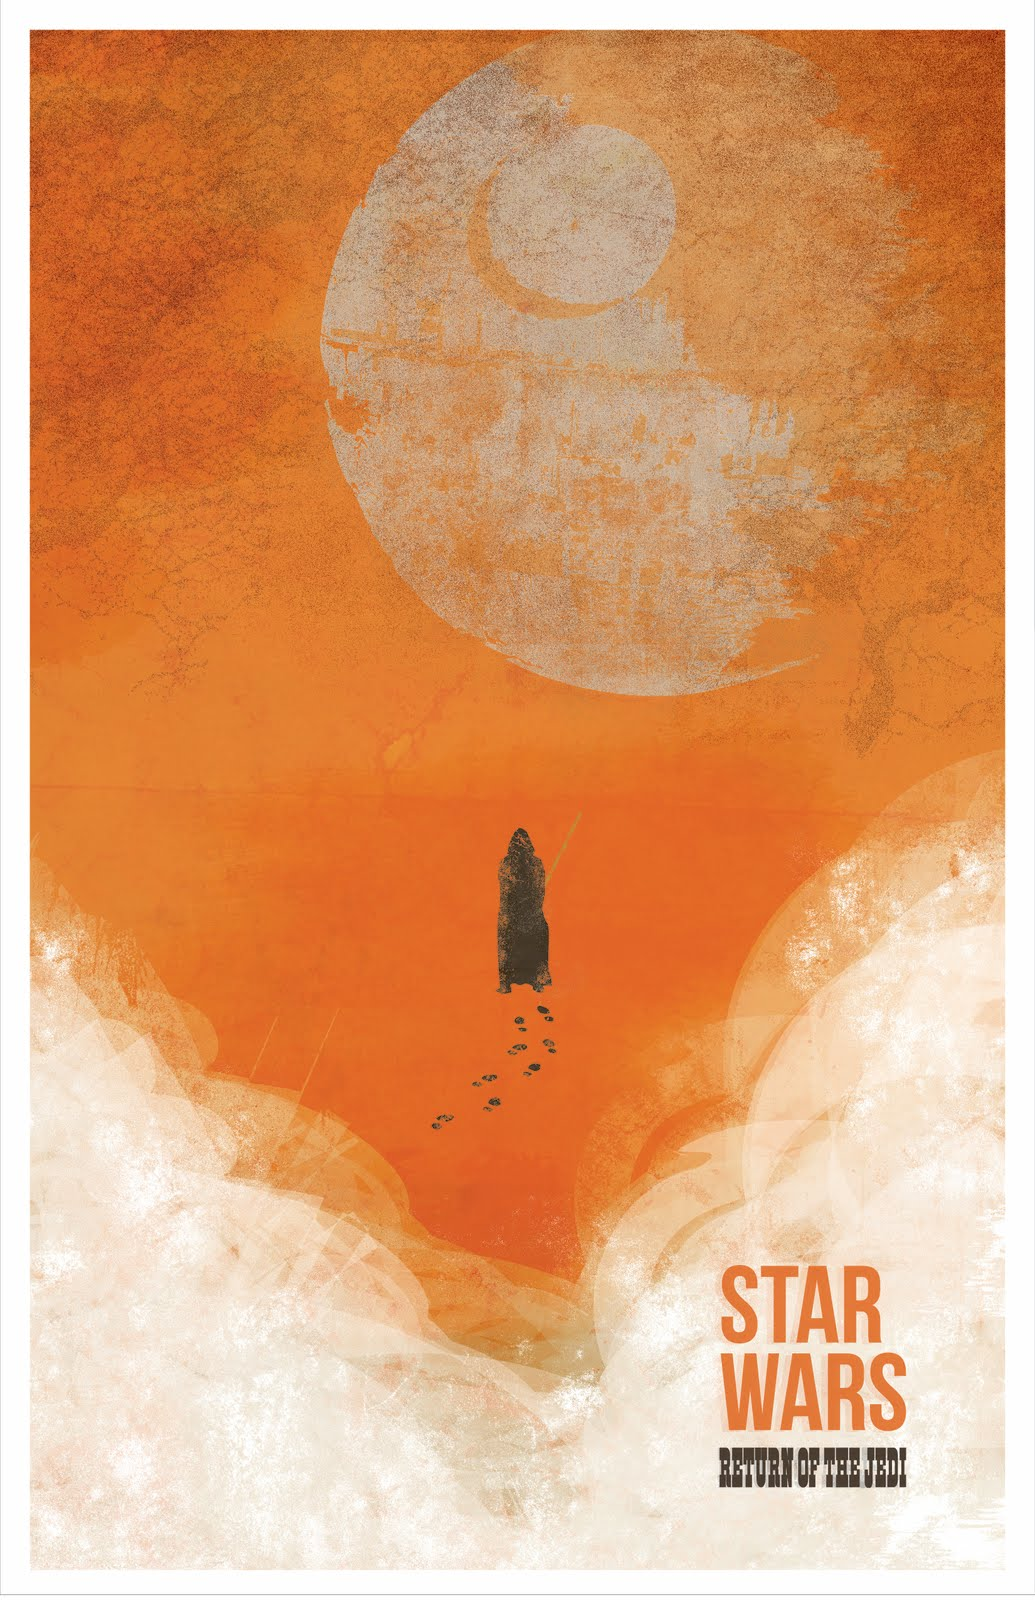 The Geeky Nerfherder: Movie Poster Art: Star Wars: Return Of The Jedi (1983)